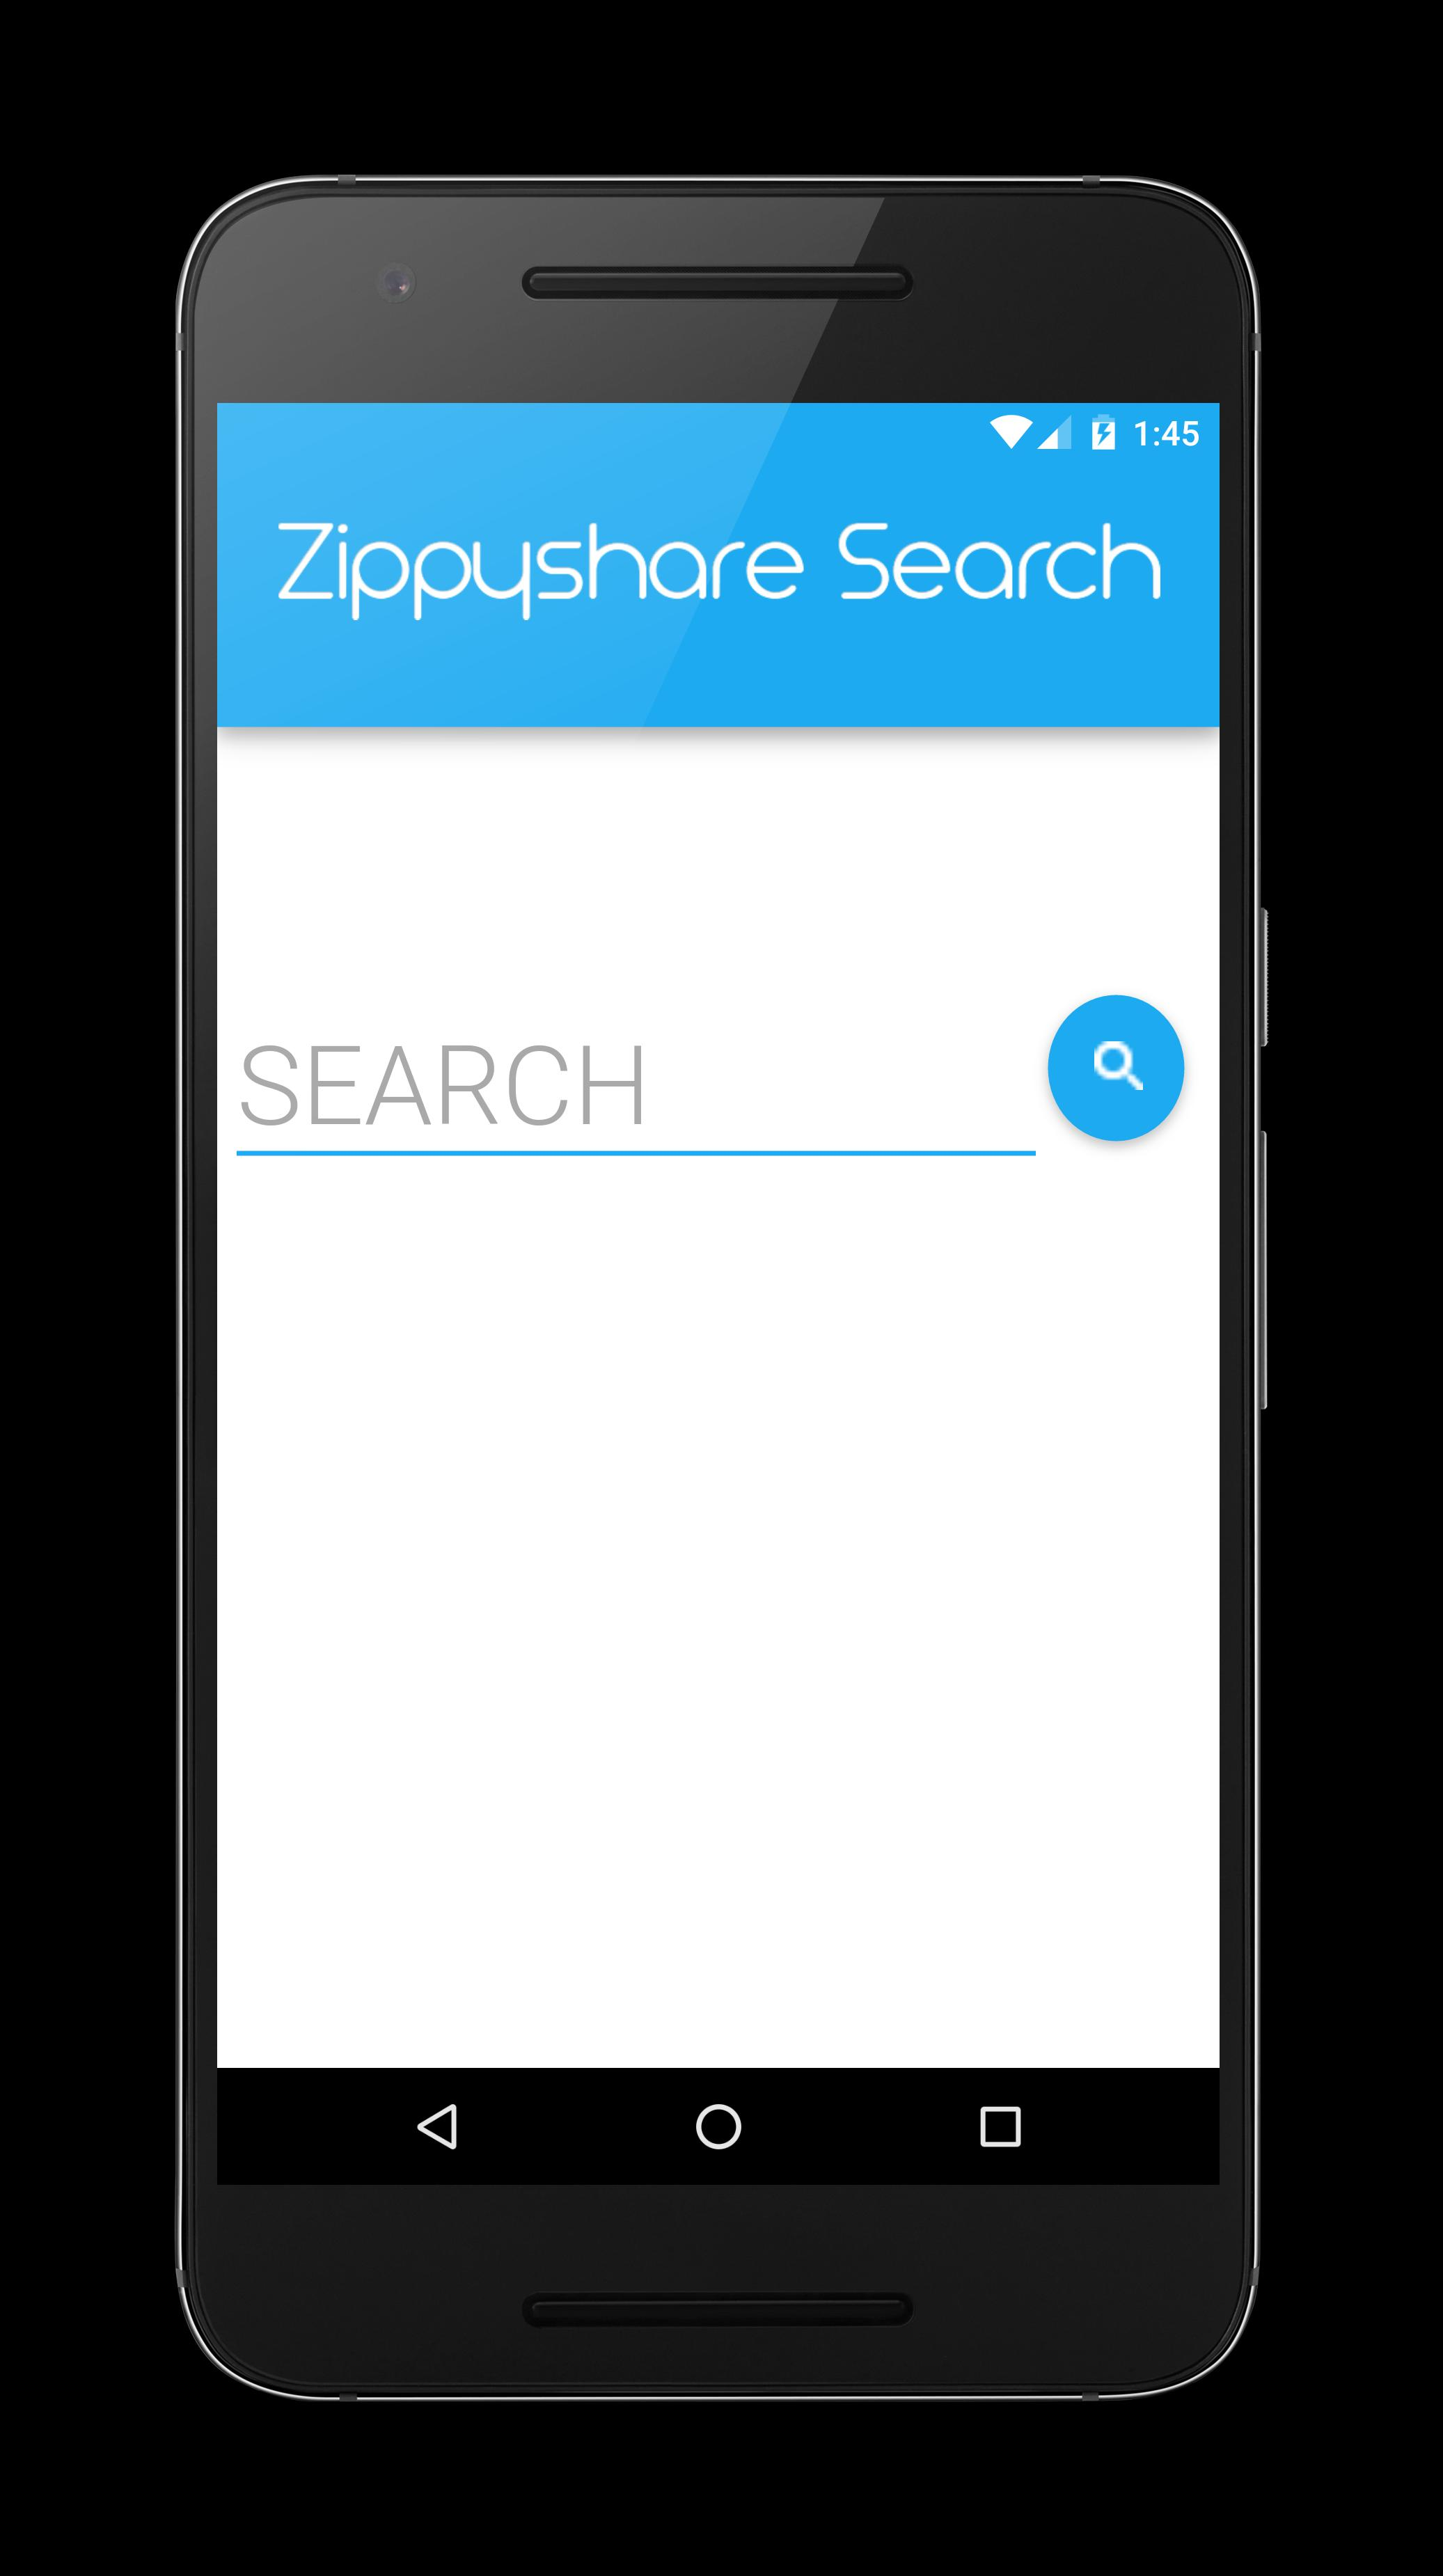 Zippyshare App